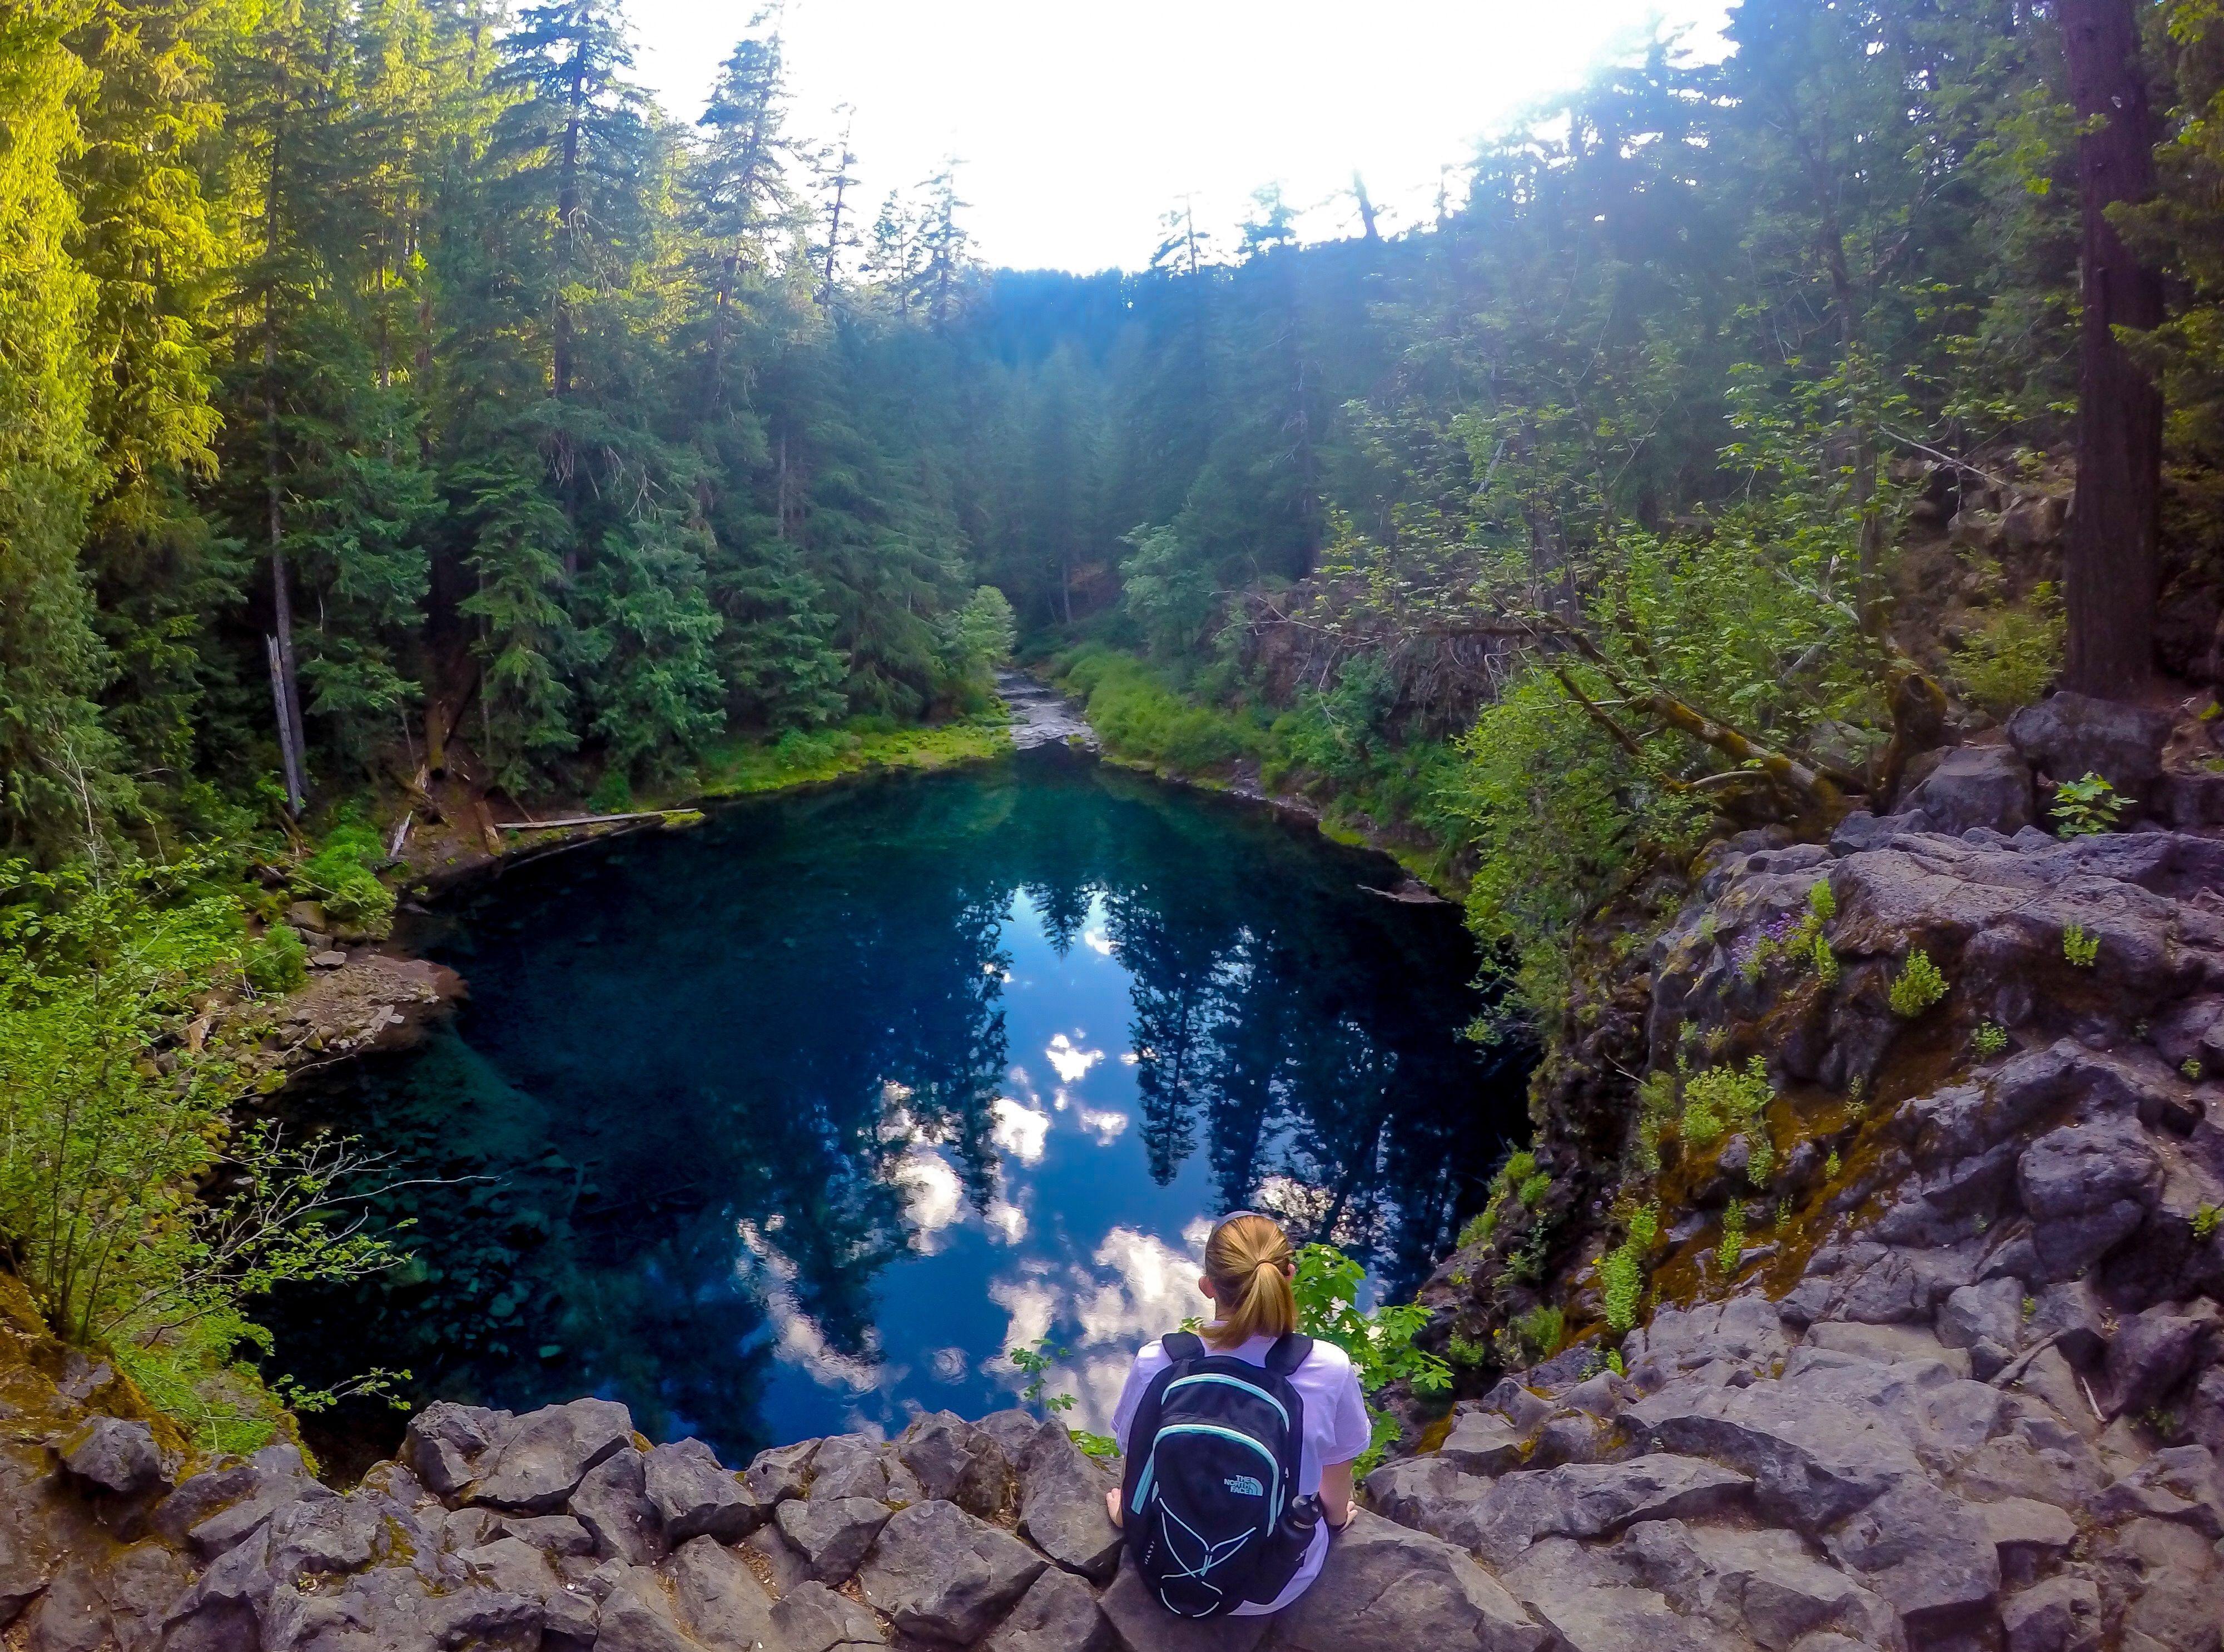 Tamolitch Blue Pool Mckenzie River Oregon Pnw Adventures Pinterest Blue Pool River